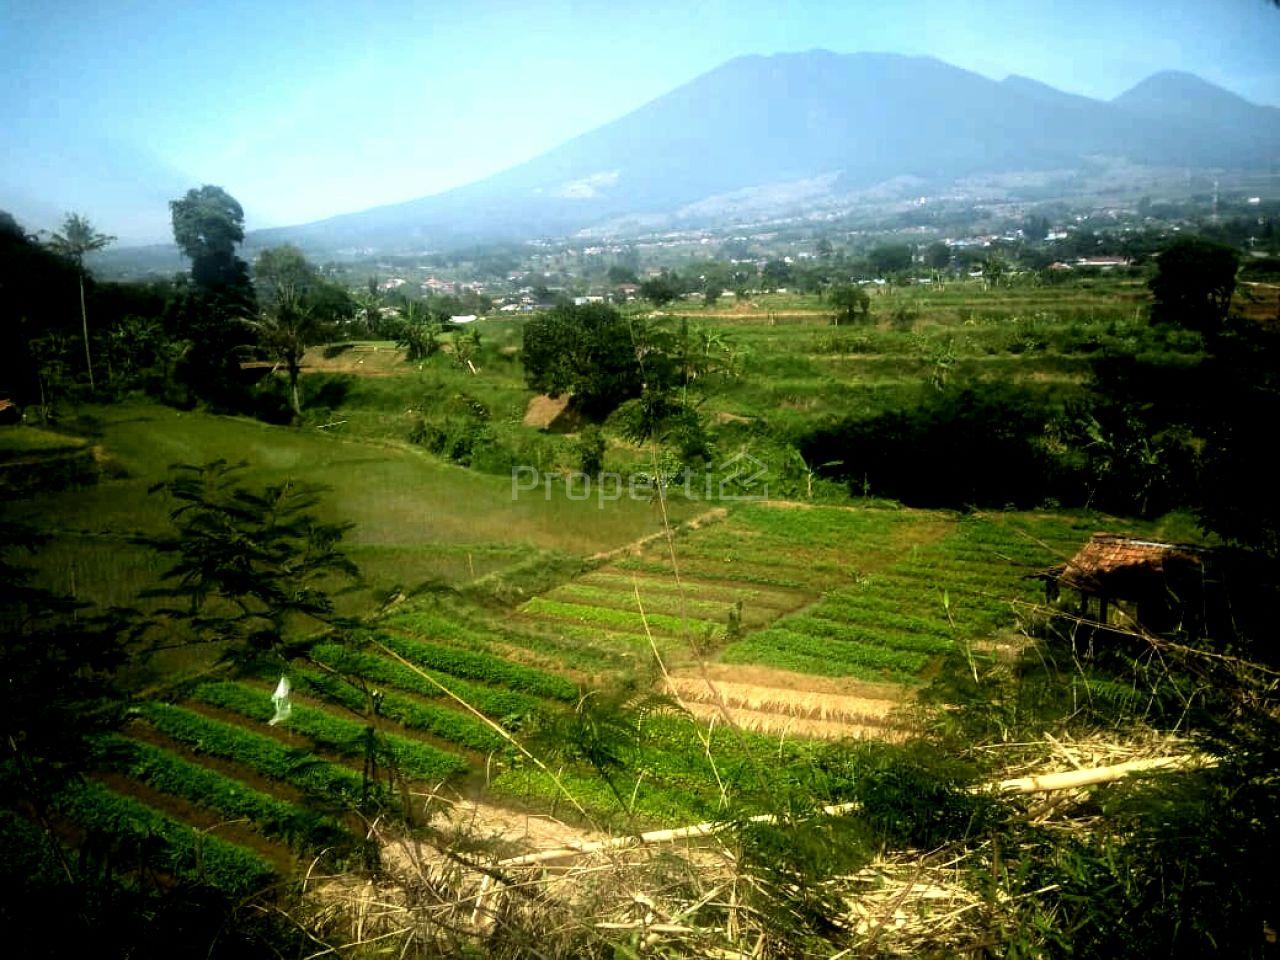 Land of Investment 30 Ha in Cianjur, West Java, Jawa Barat